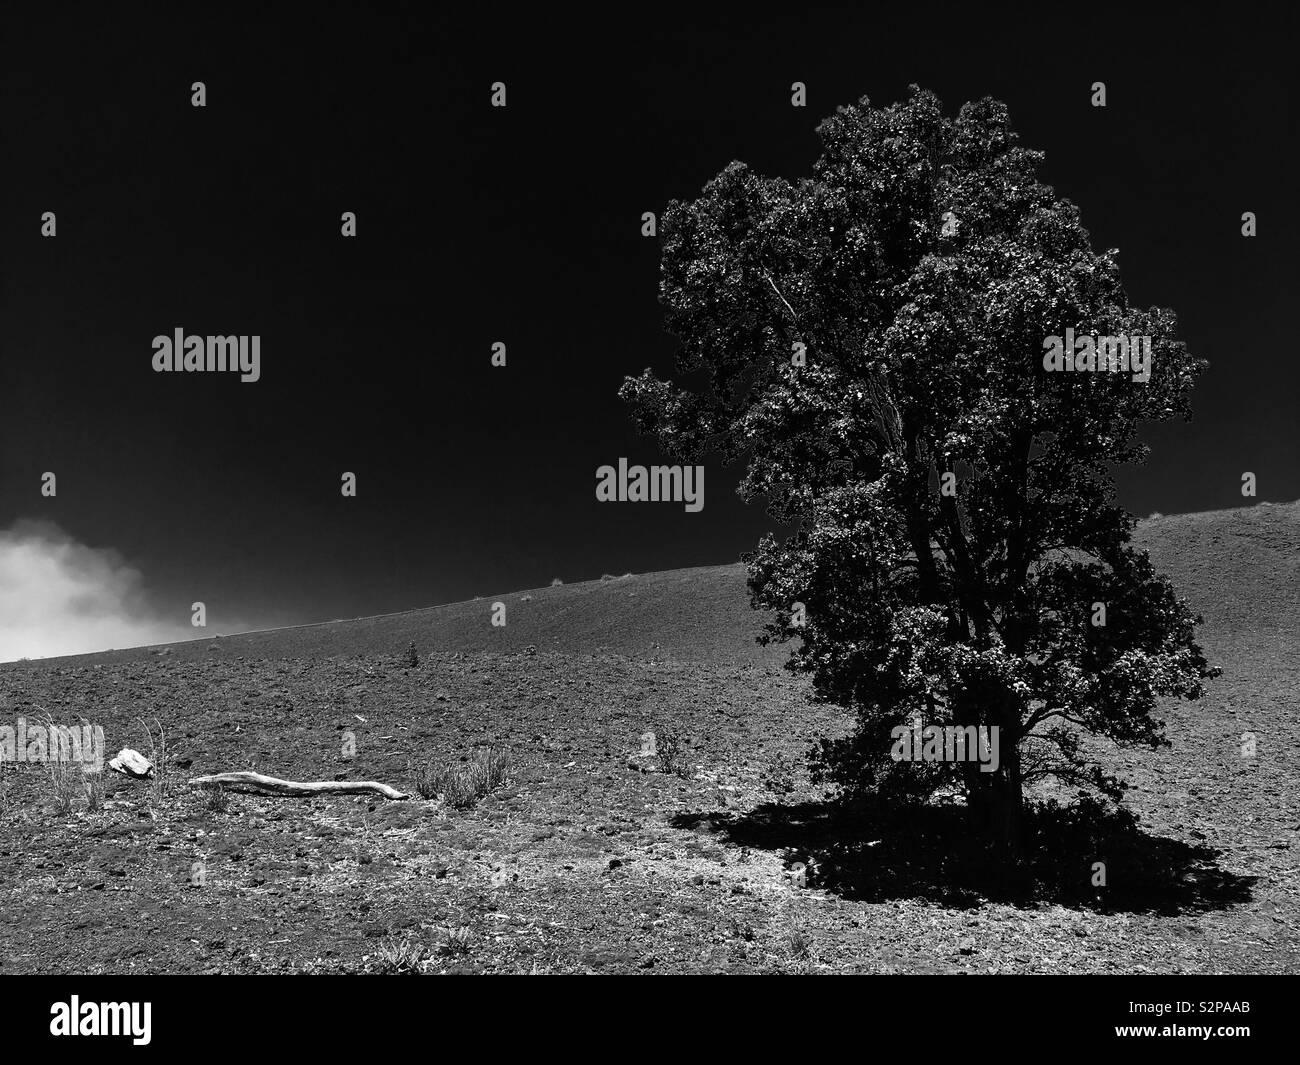 Desolation Trail - Stock Image